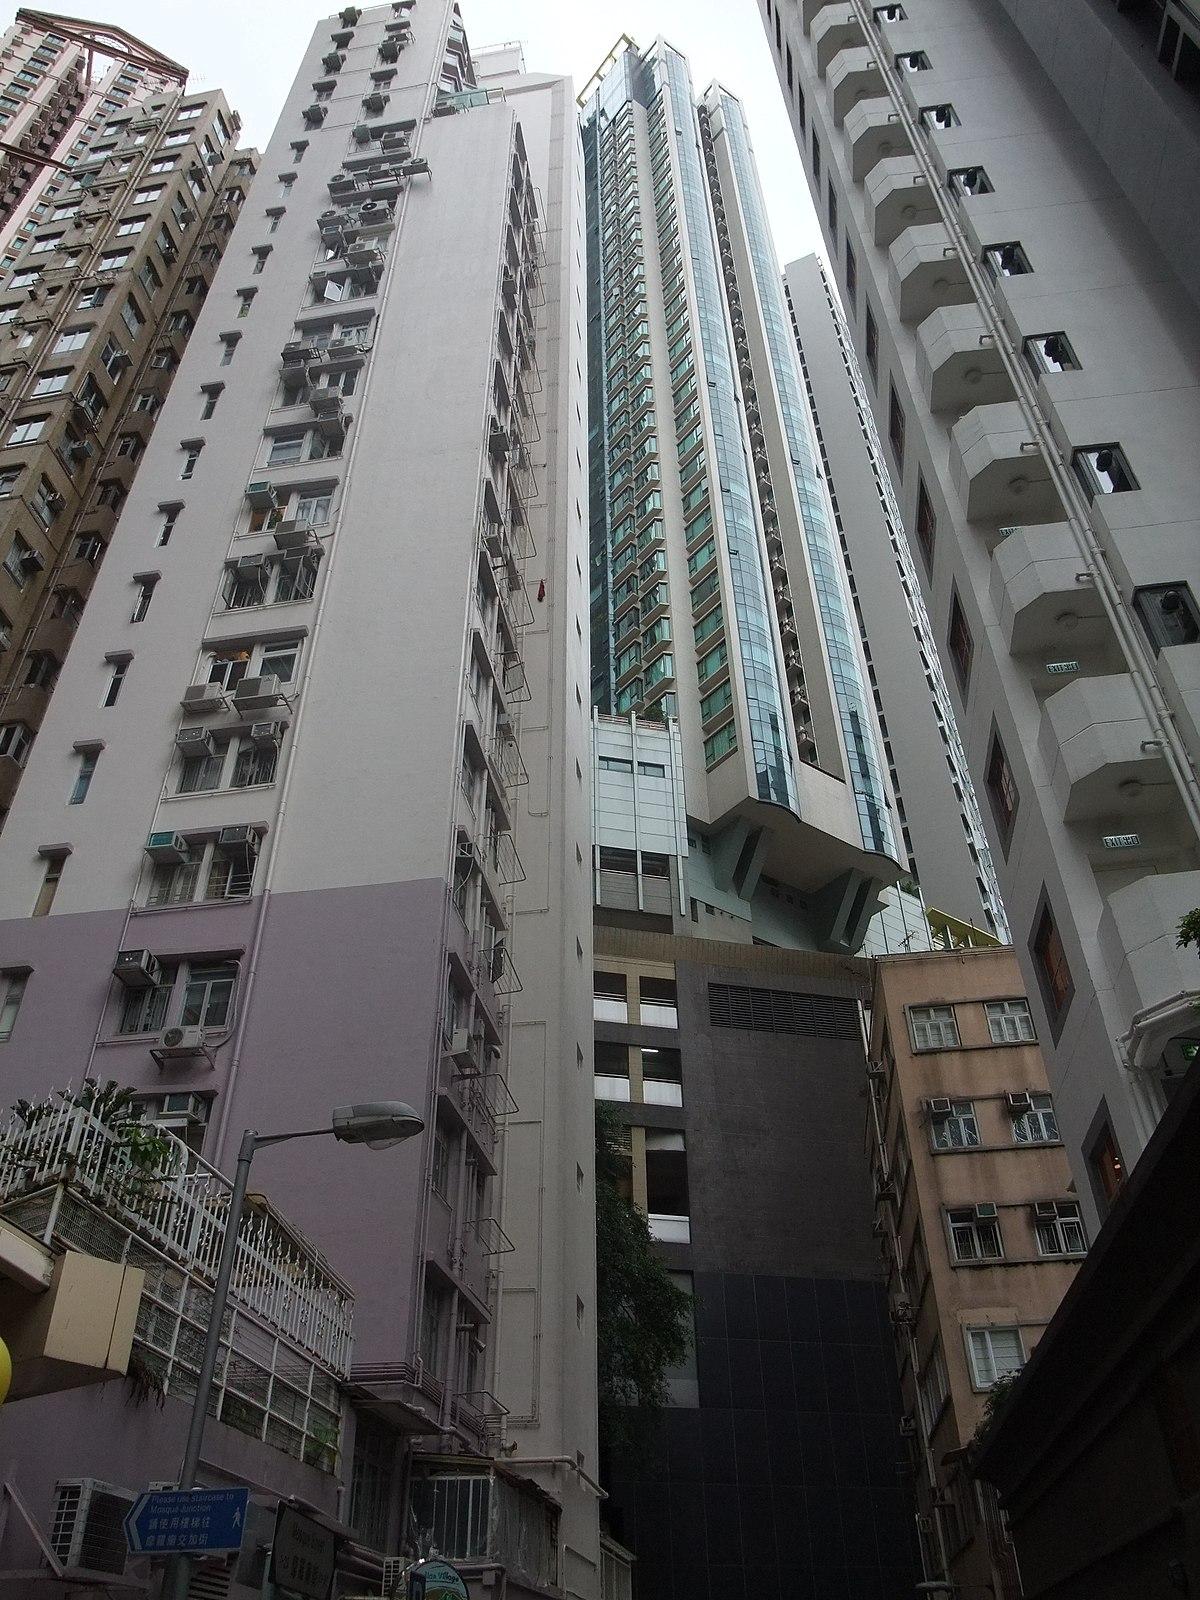 Palatial Properties In Uk For Sale